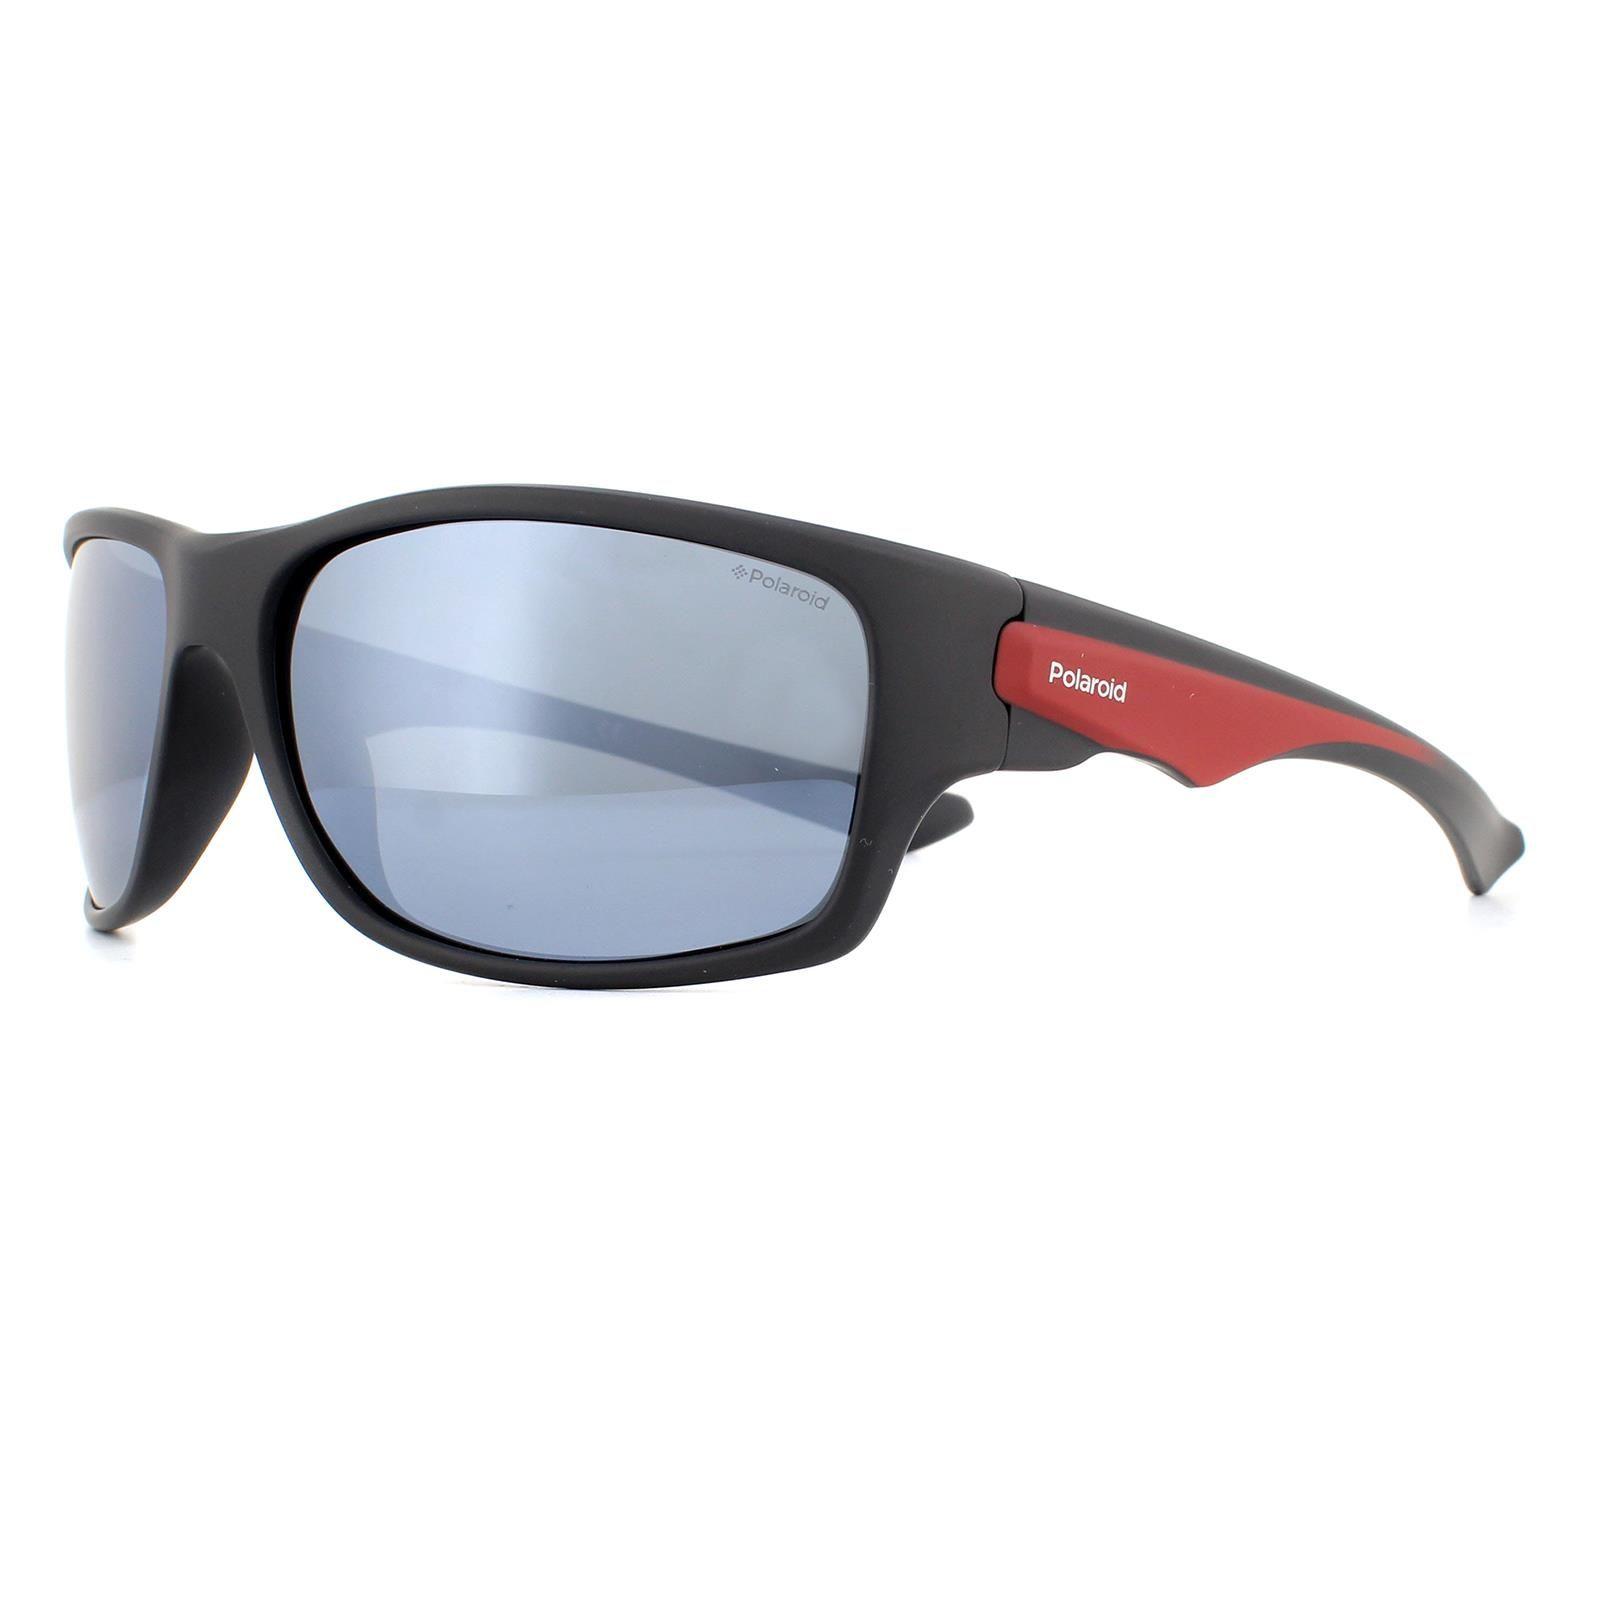 Polaroid Sunglasses PLD 7012/S OIT EX Black Red  Grey Silver Polarized Mirror